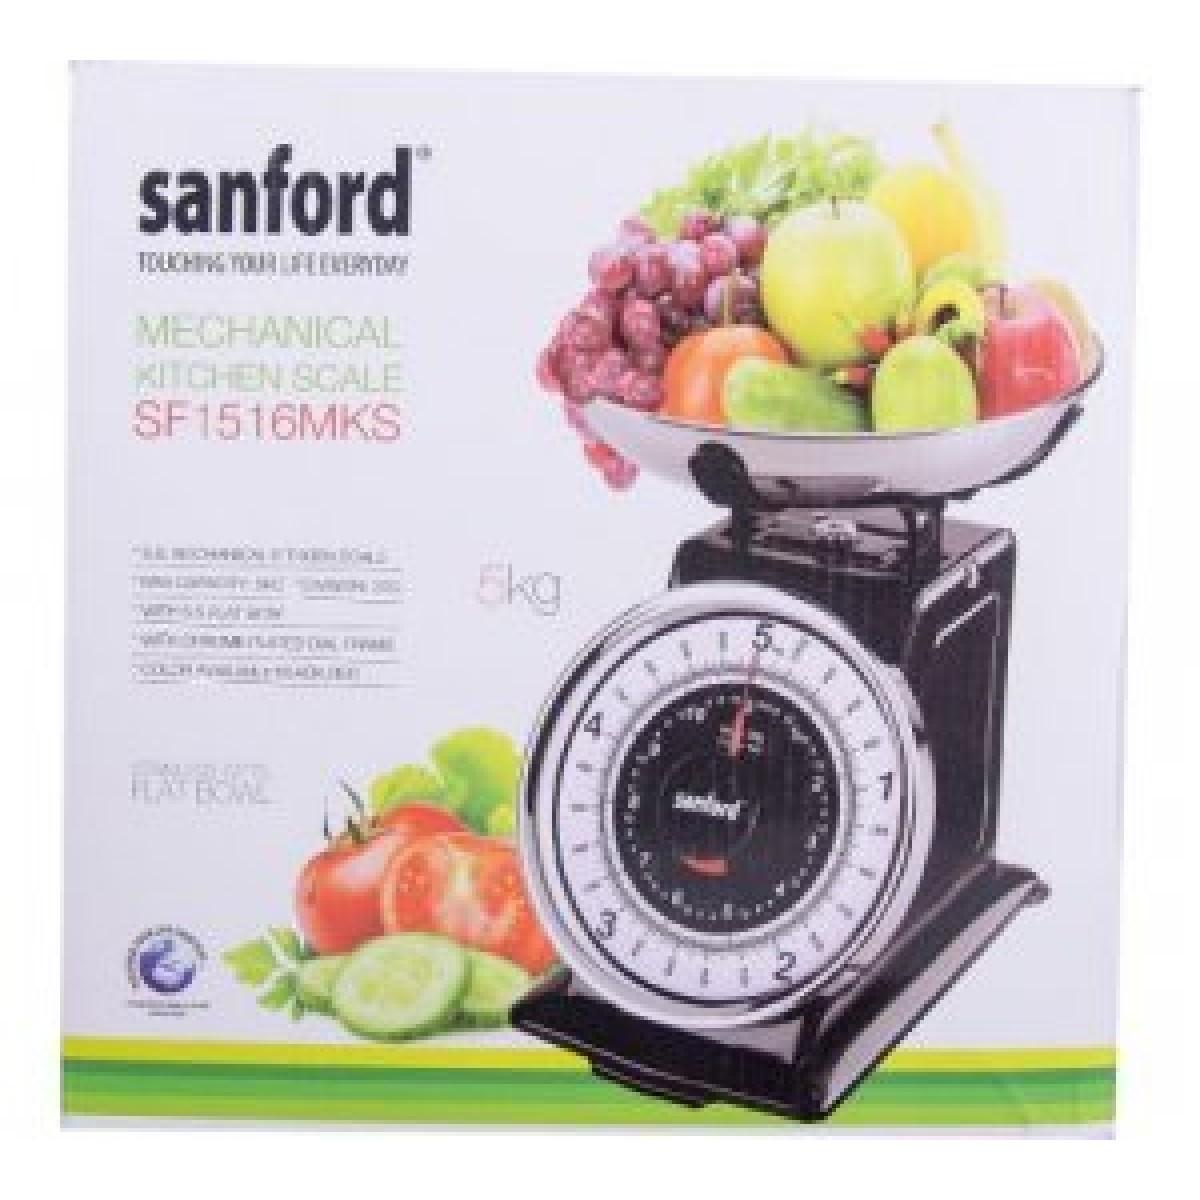 ميزان مطبخ من سانفورد رقم SF1516MKS